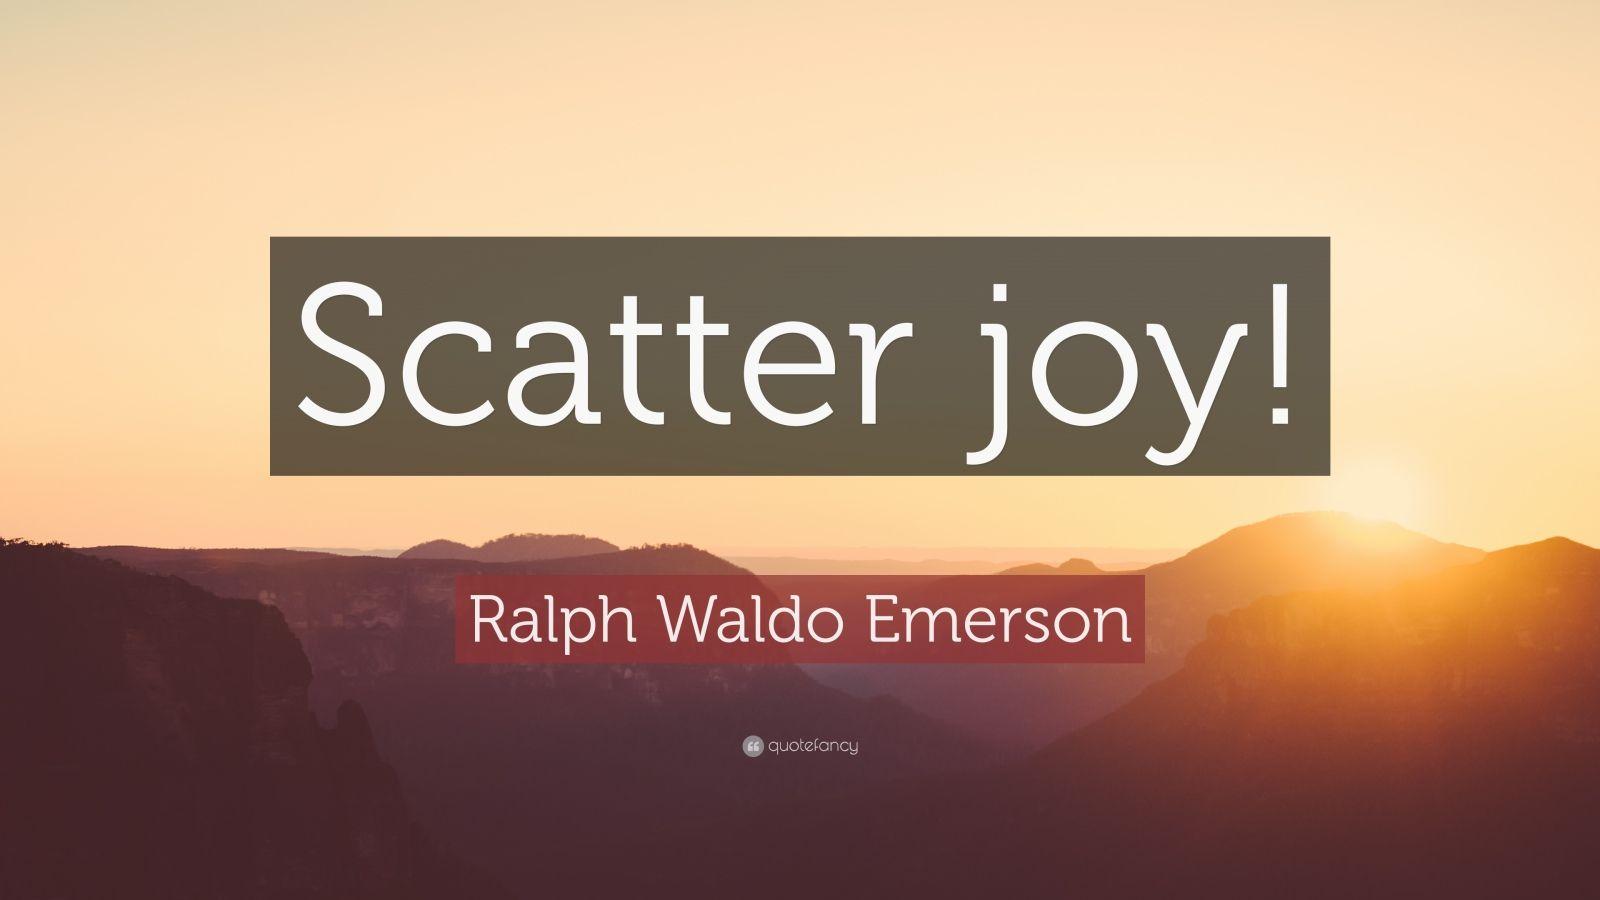 Ralph Waldo Emerson Quotes Wallpaper